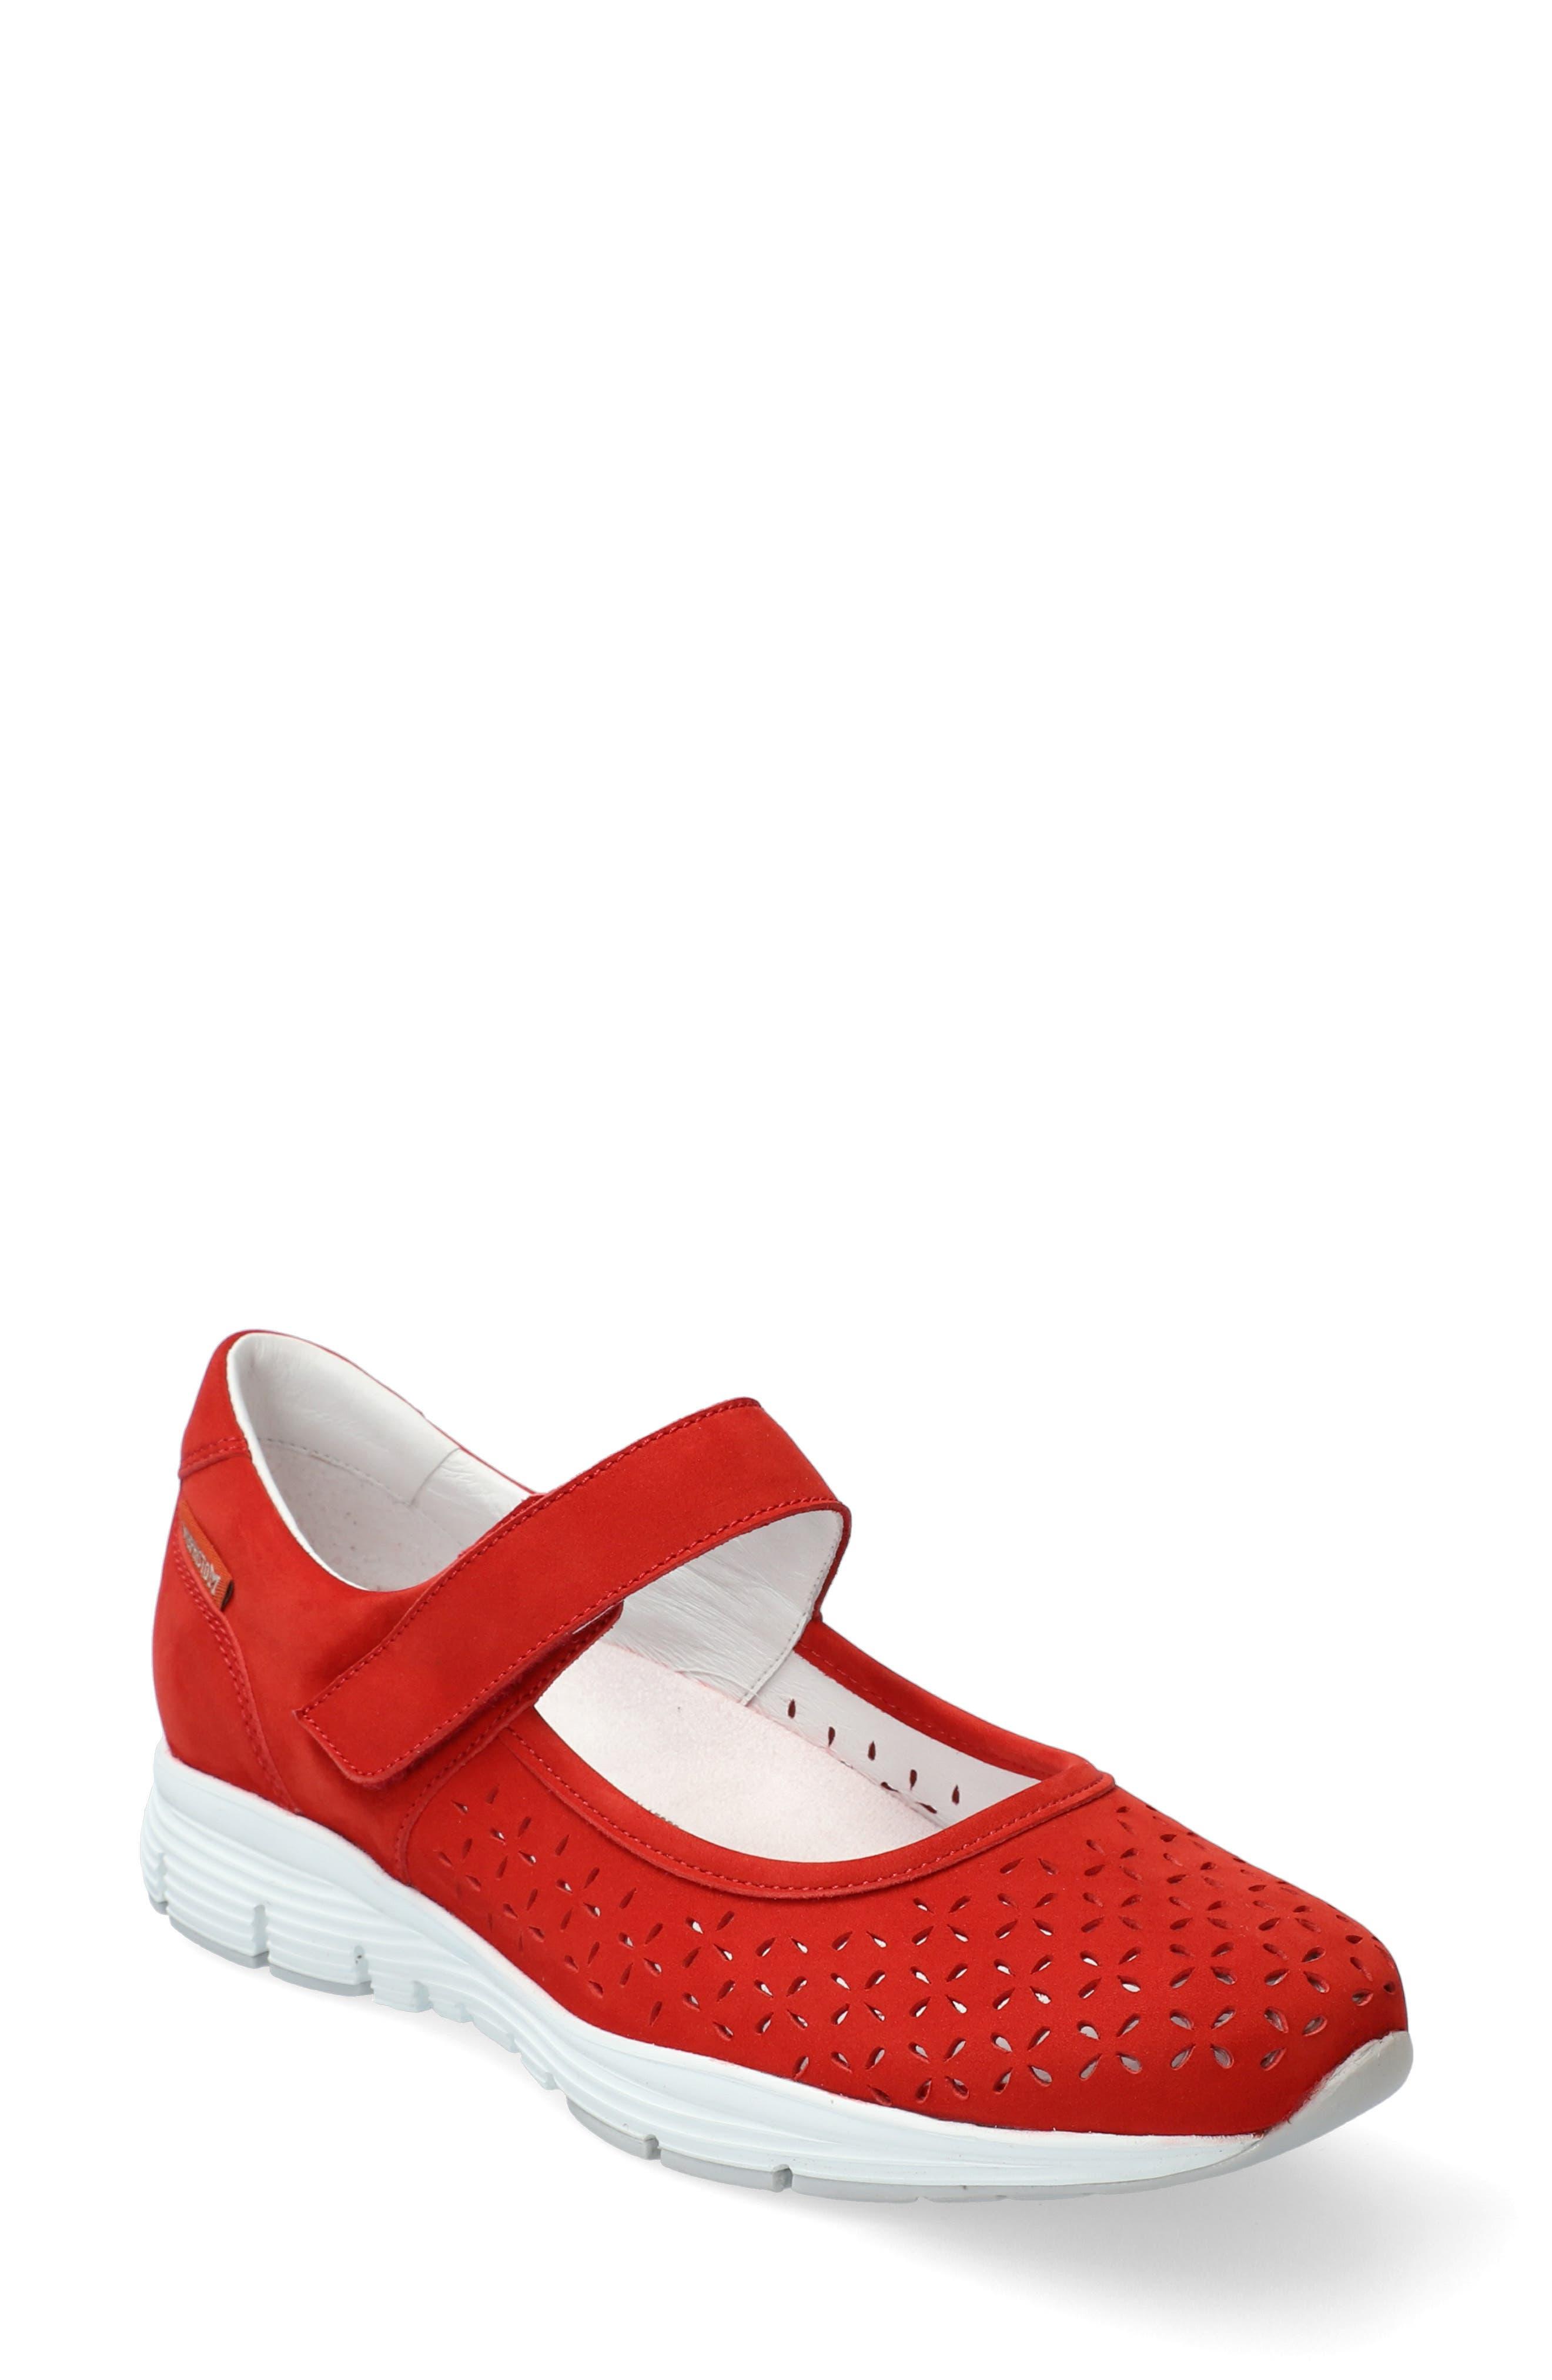 Women's Mary Jane Sneakers \u0026 Athletic